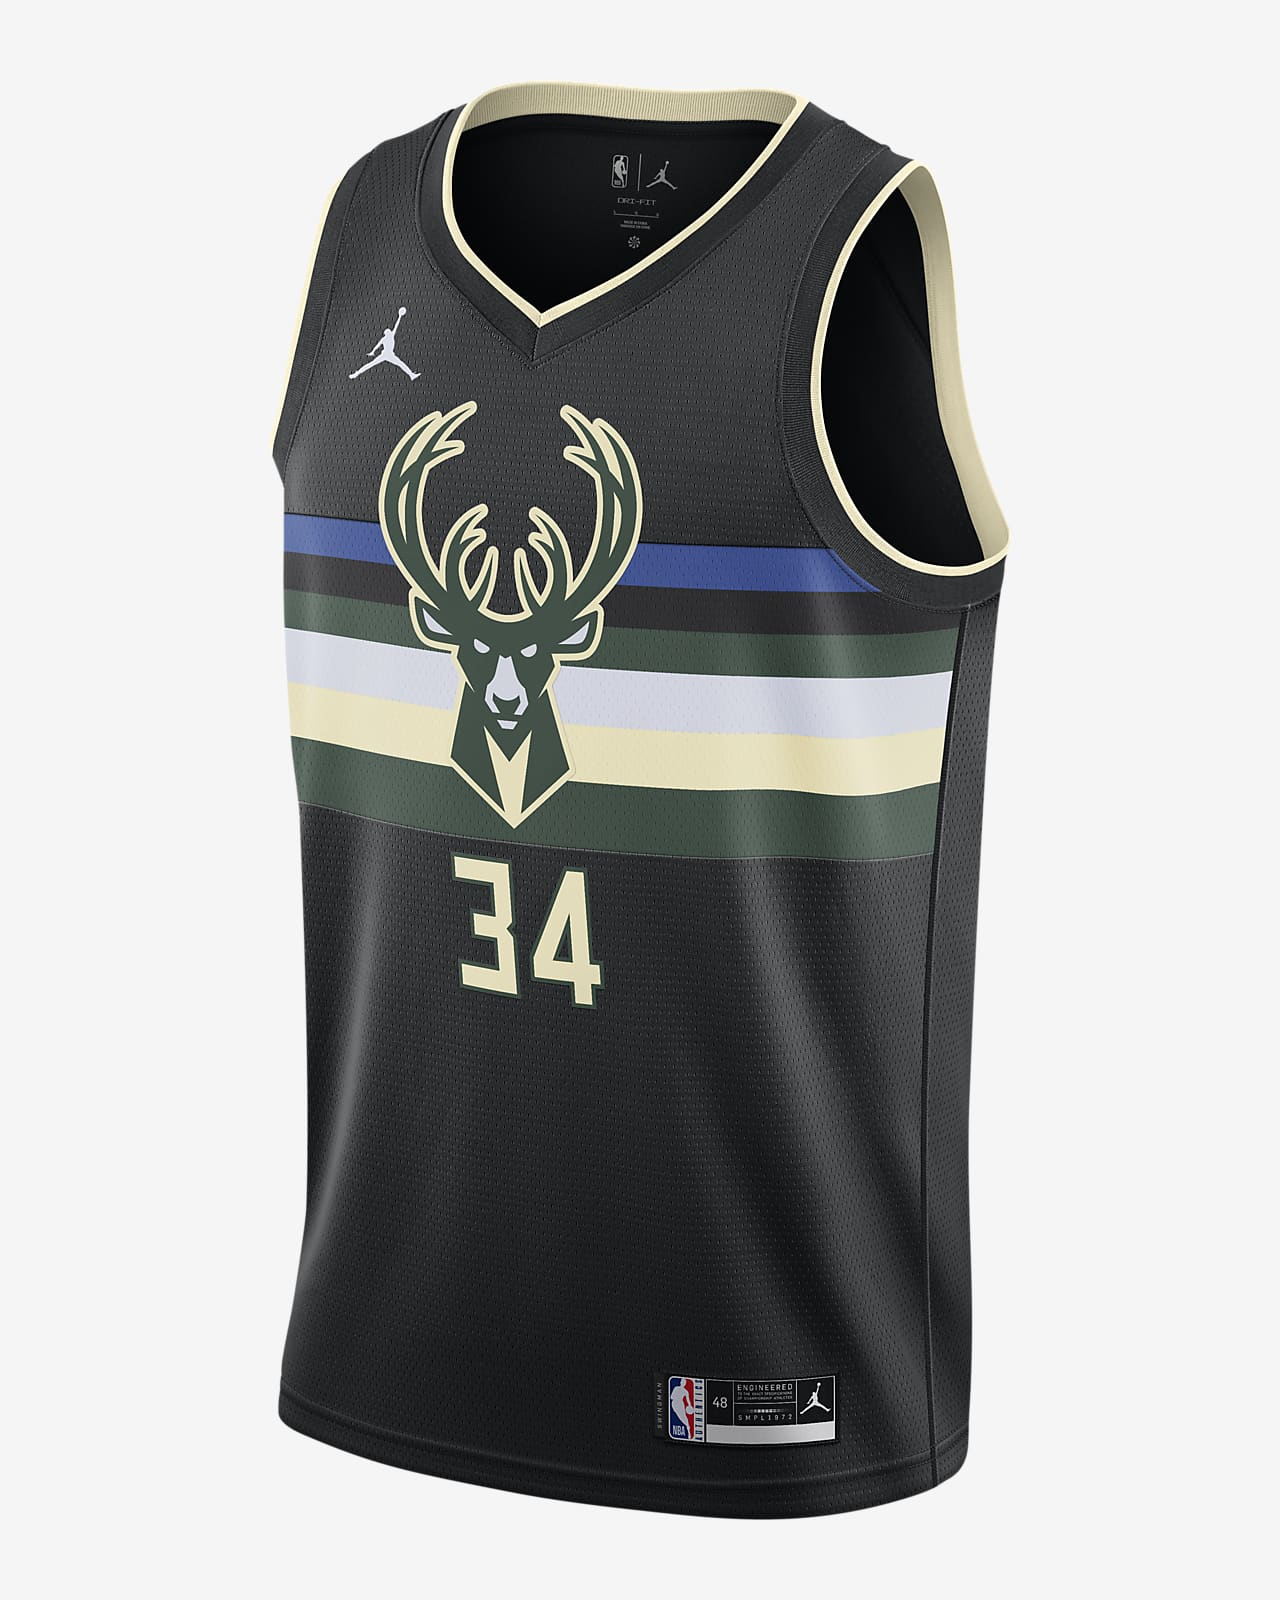 Giannis Antetokounmpo Bucks Statement Edition 2020 Jordan NBA Swingman Jersey